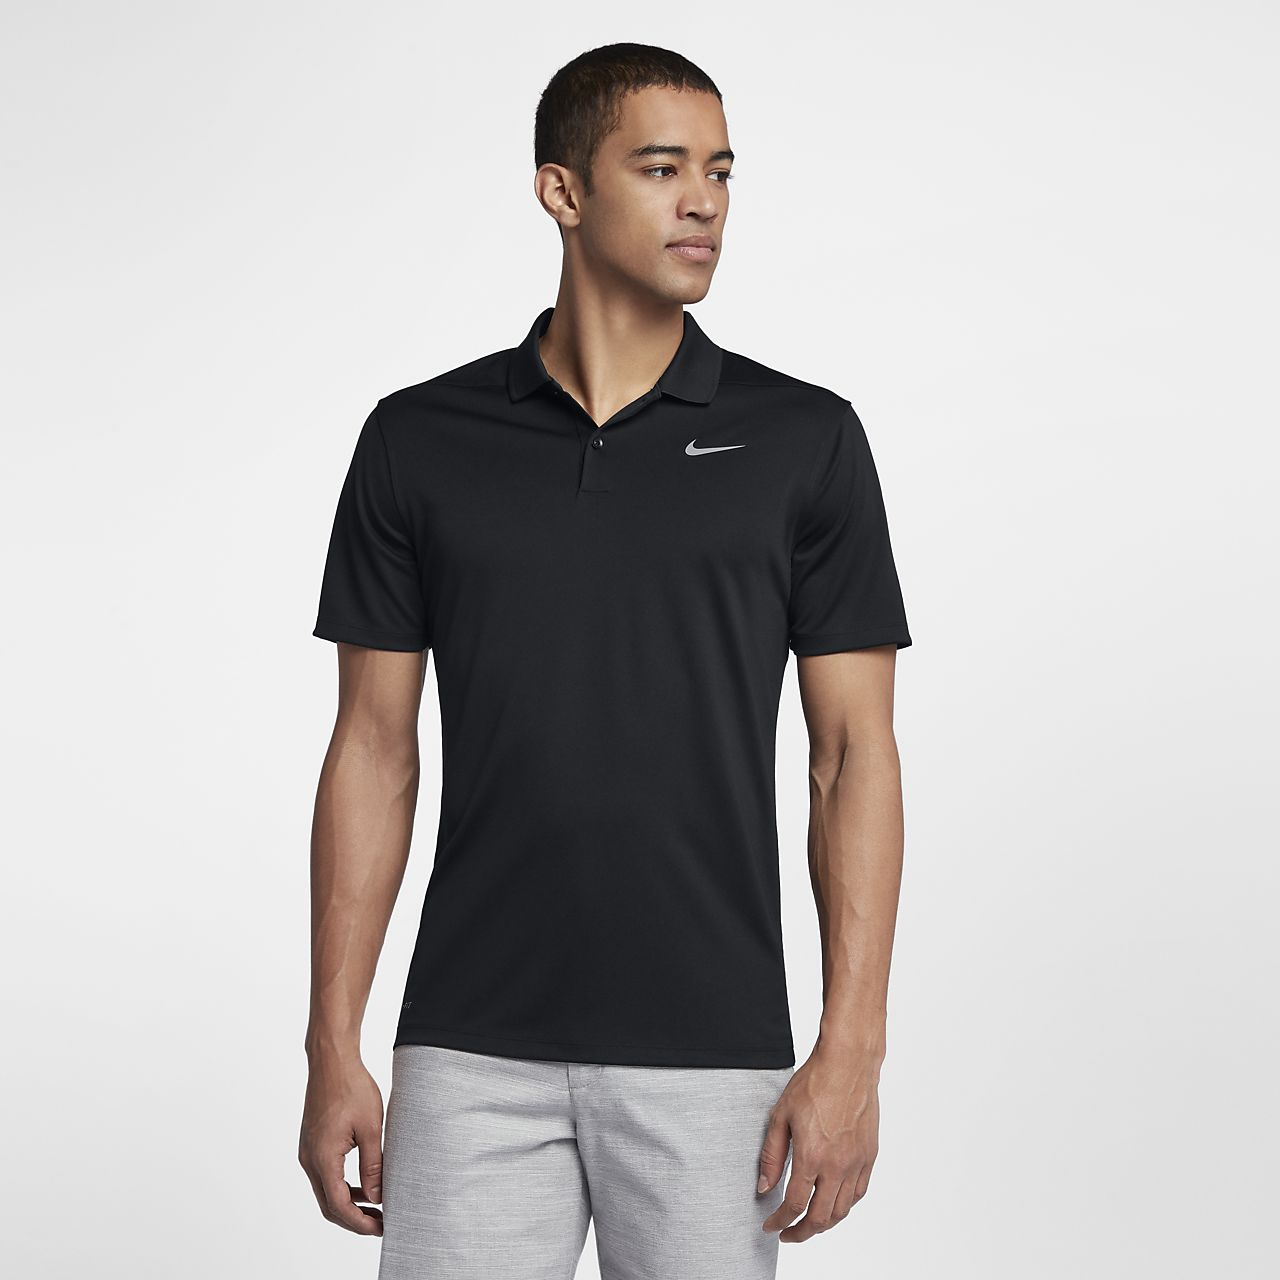 6666320aecf0 Nike Dri-FIT Victory Men s Slim-Fit Golf Polo. Nike.com IN